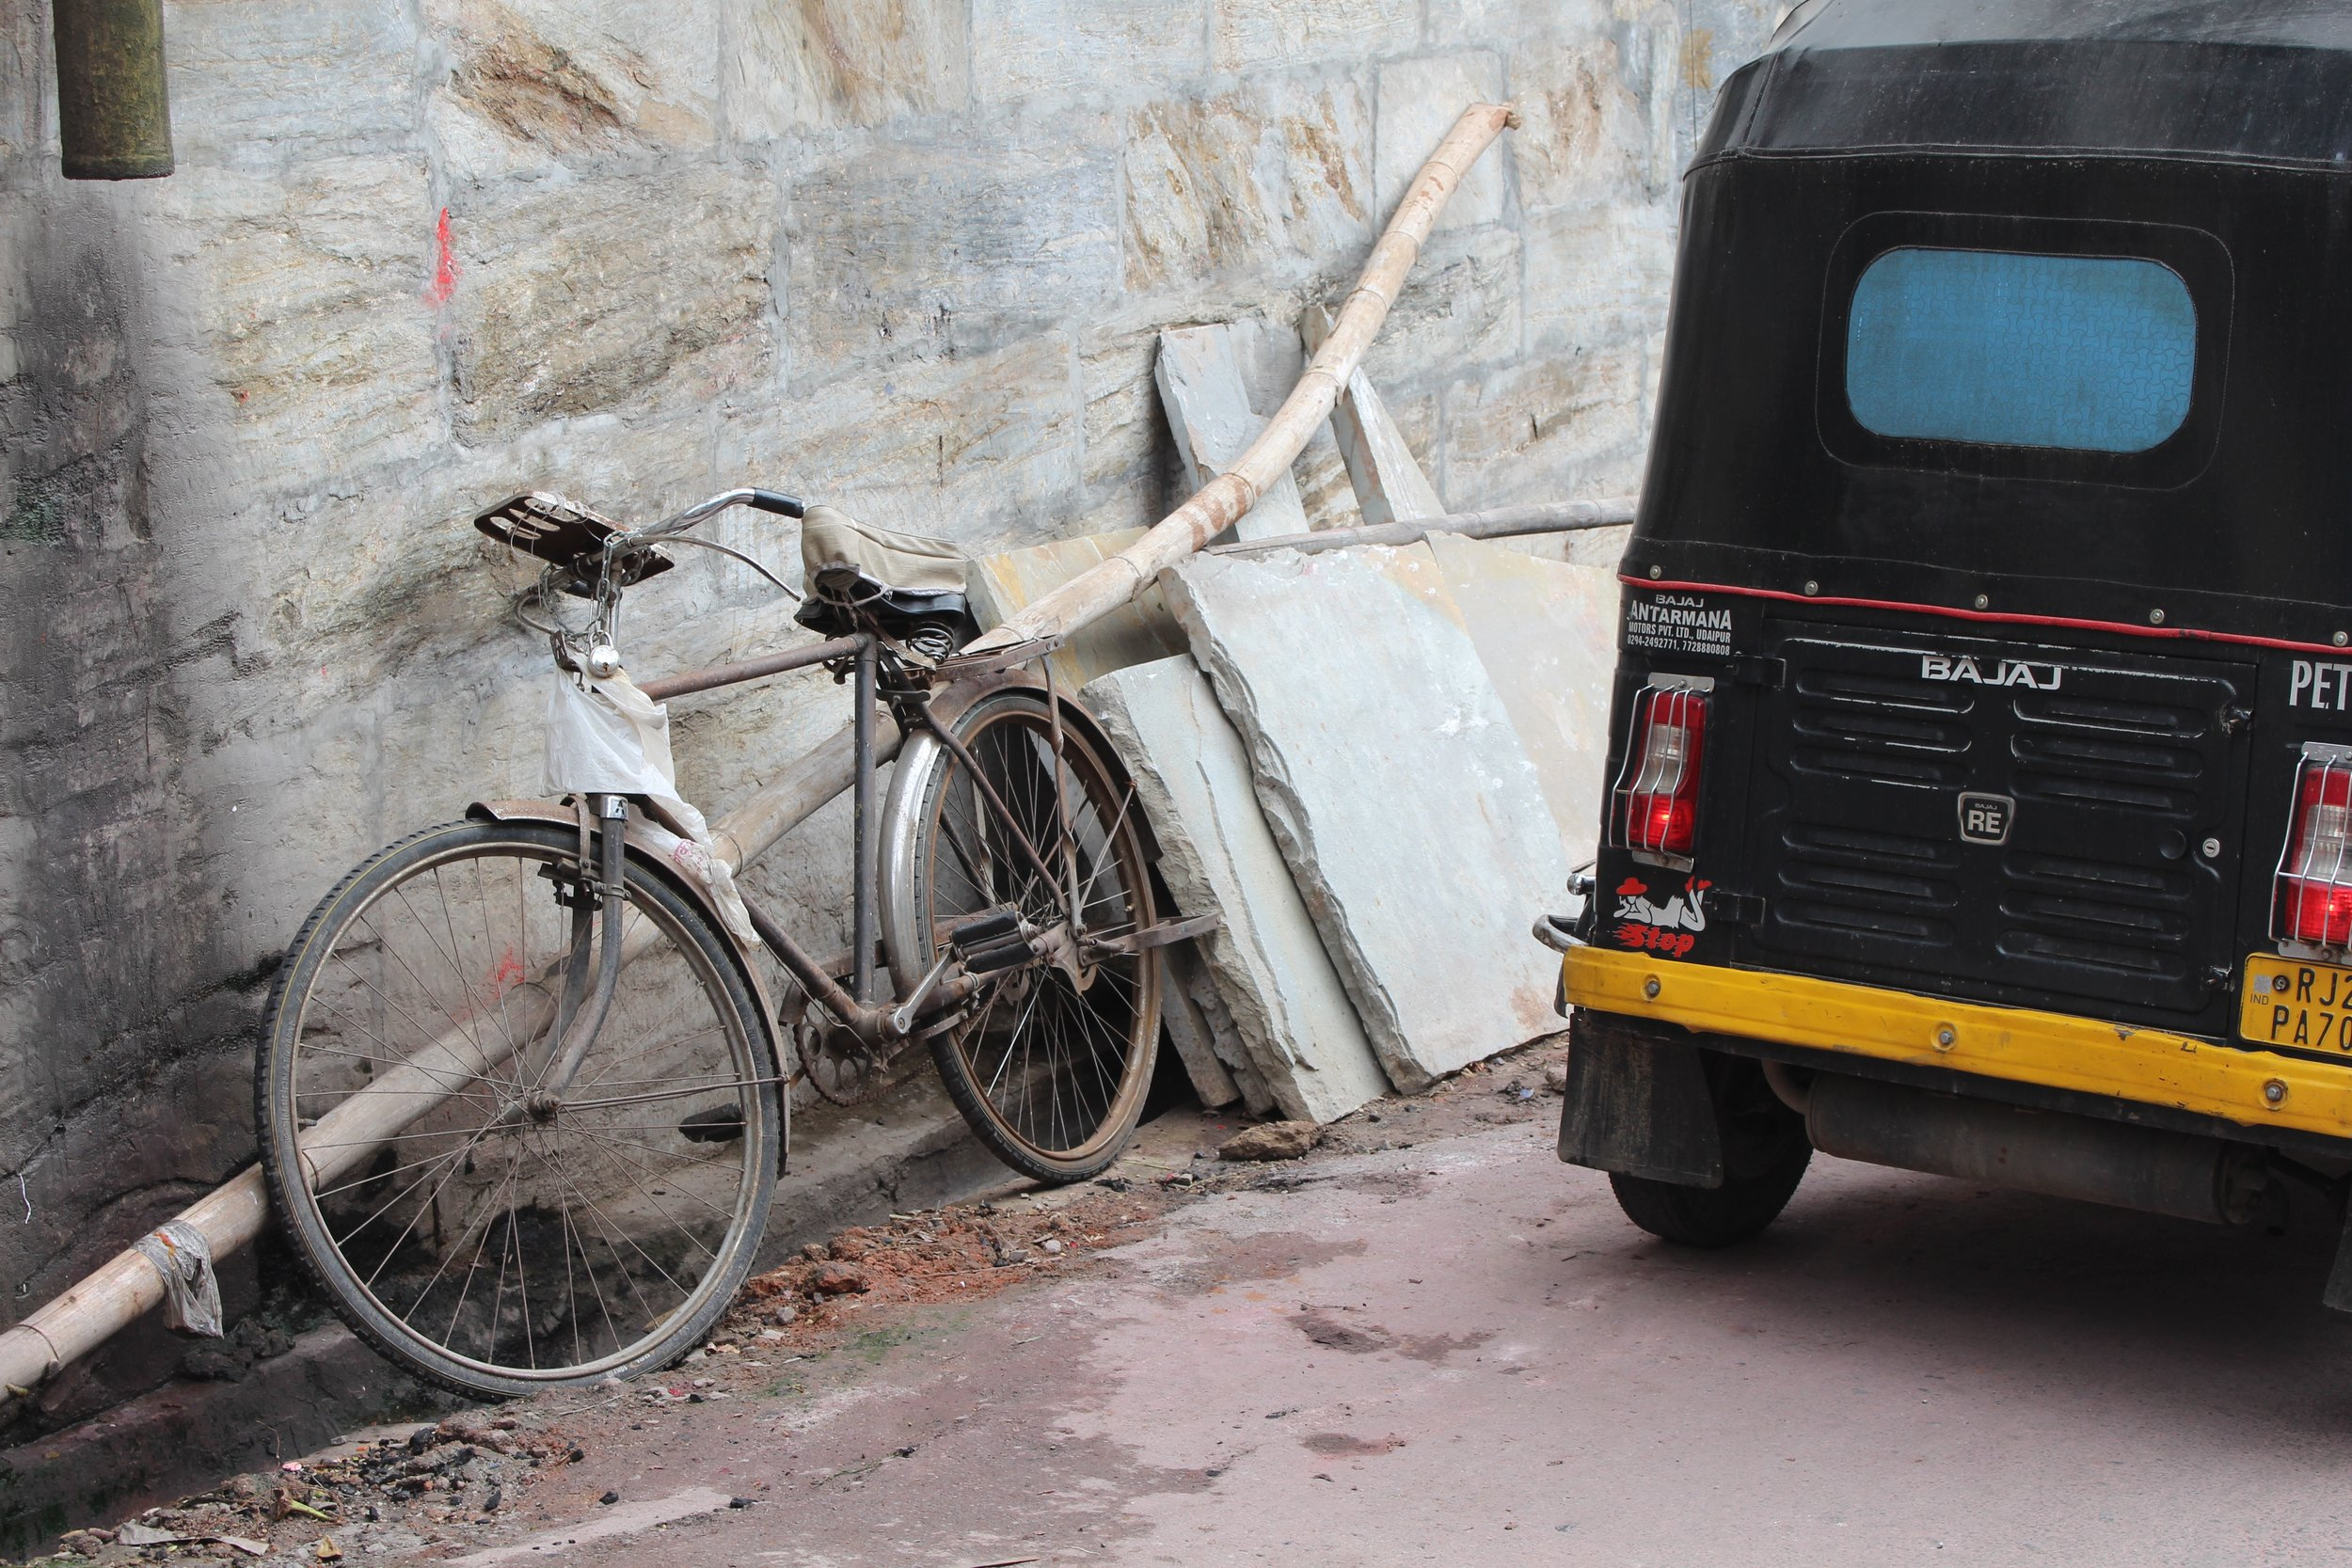 Bike and Rickshaw in Udaipur